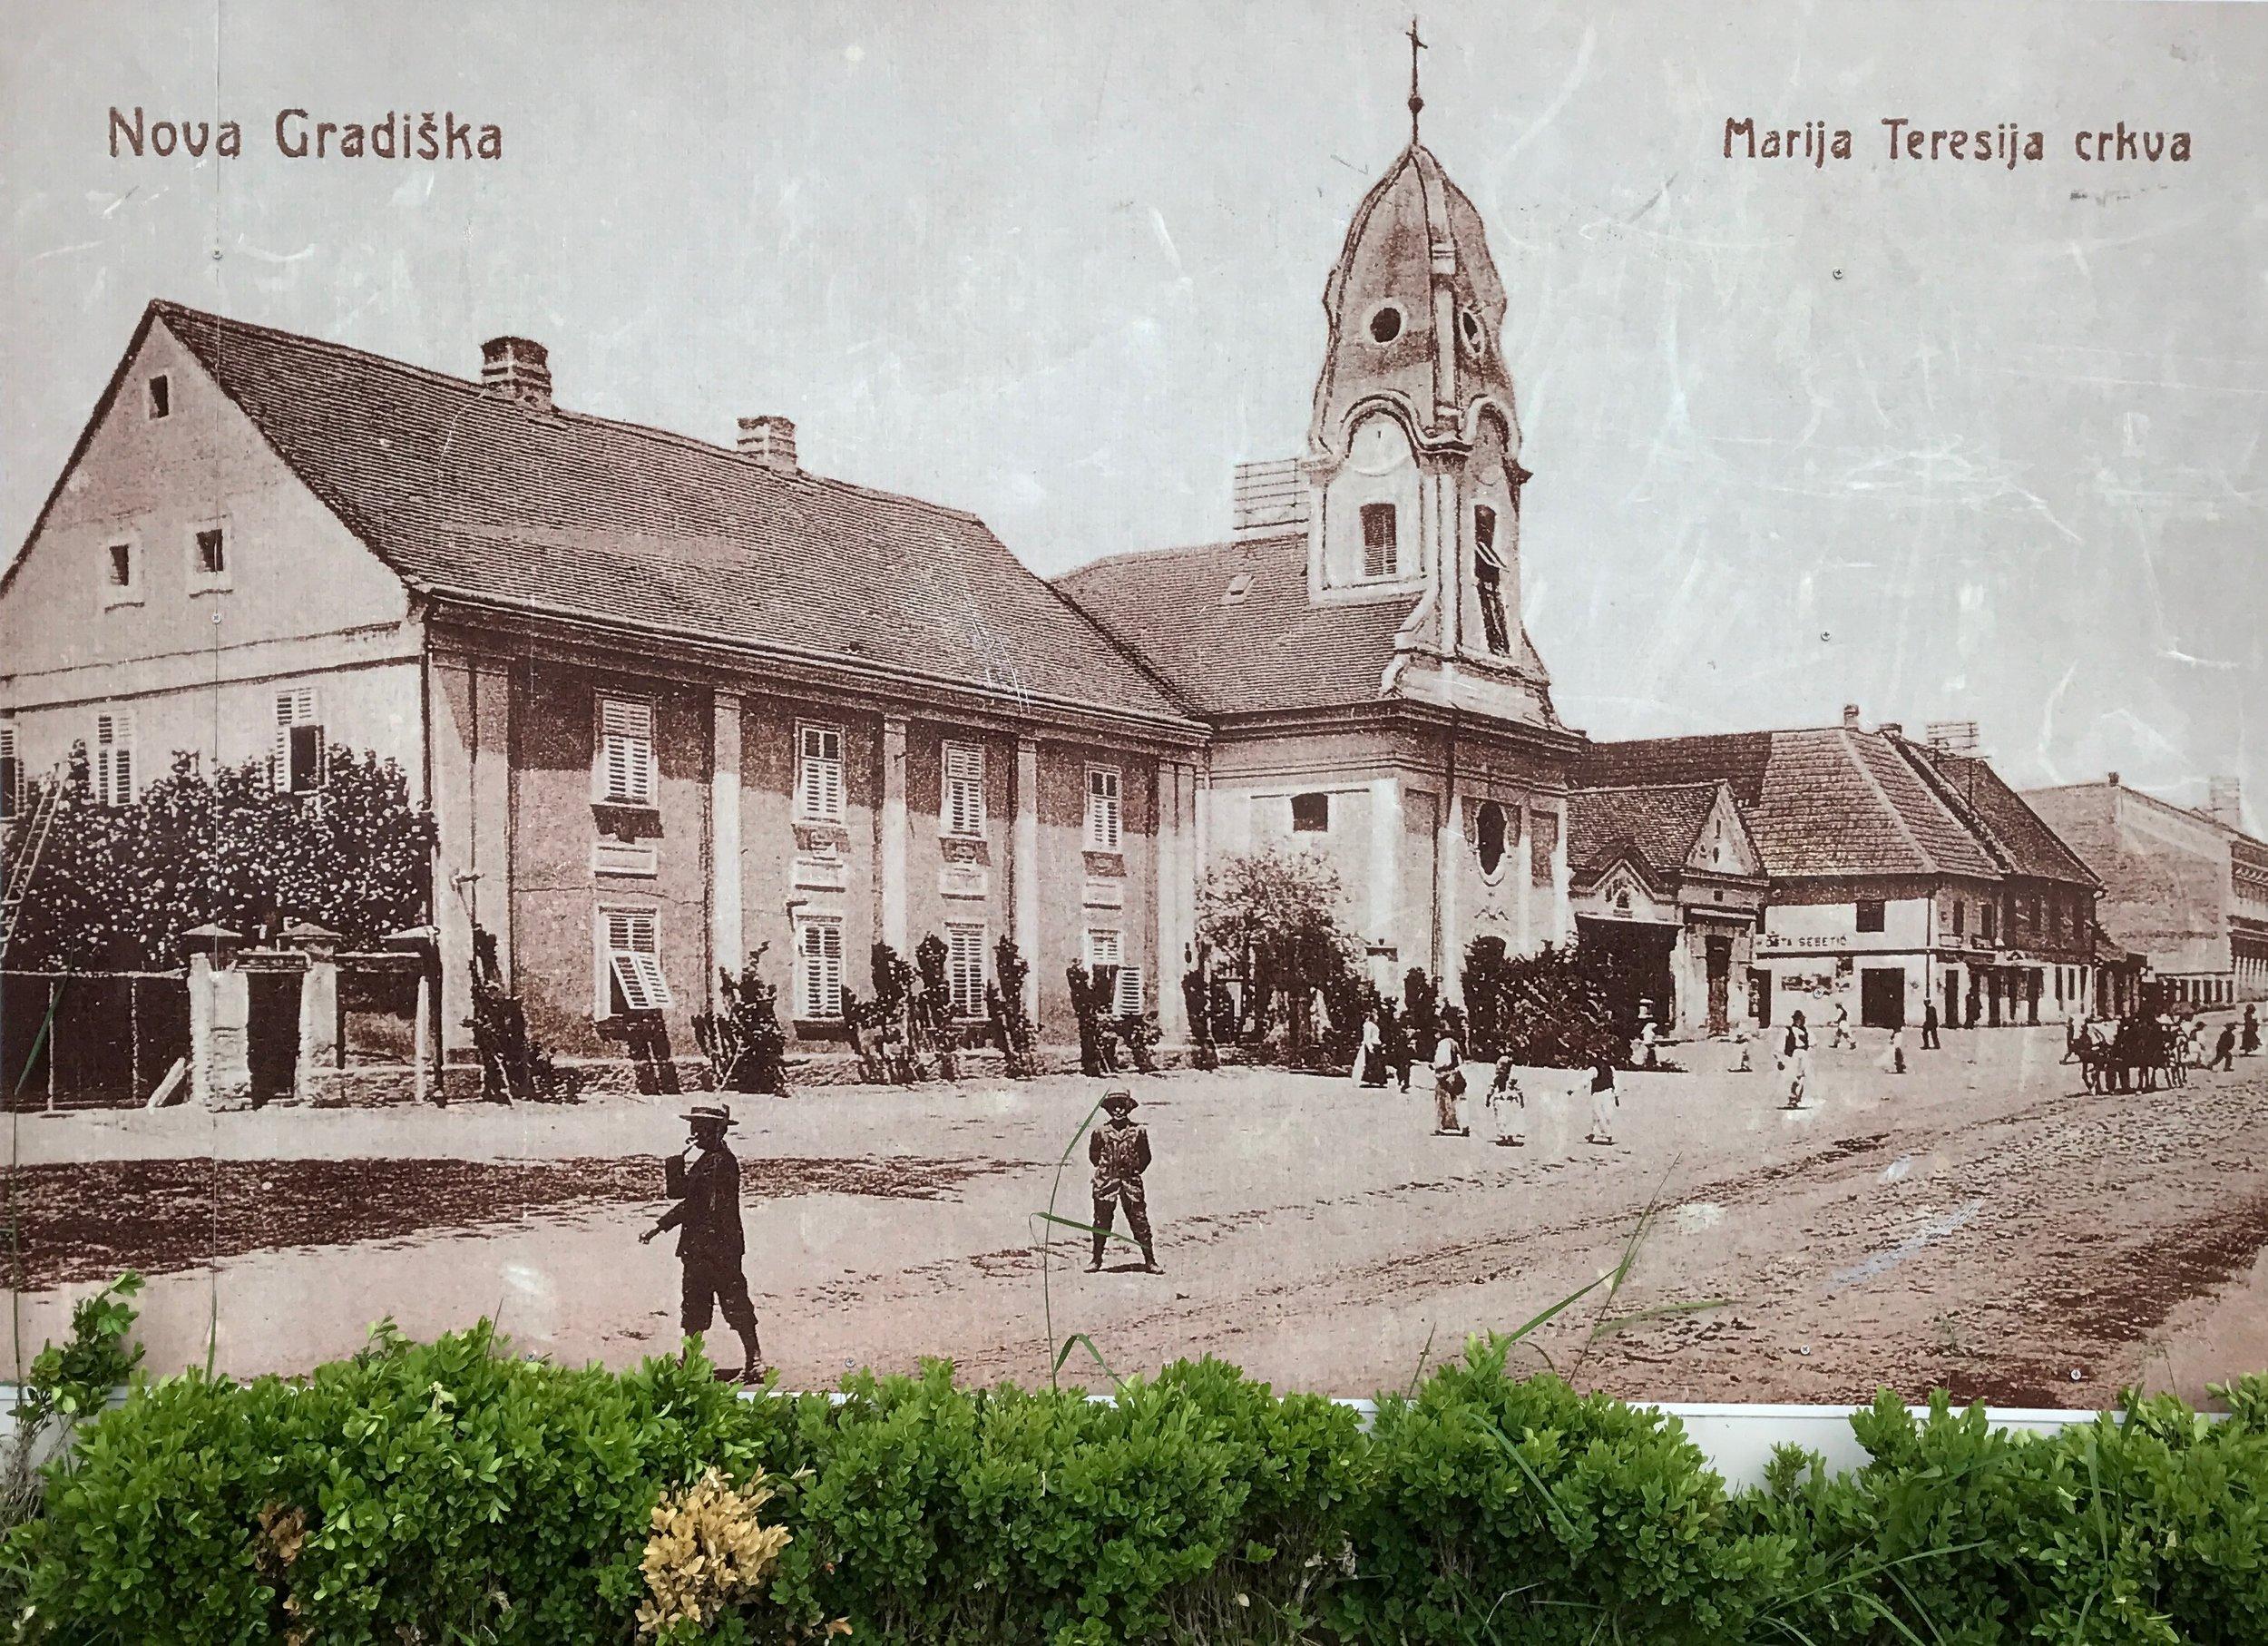 Marija Teresija Church - late 1800s?